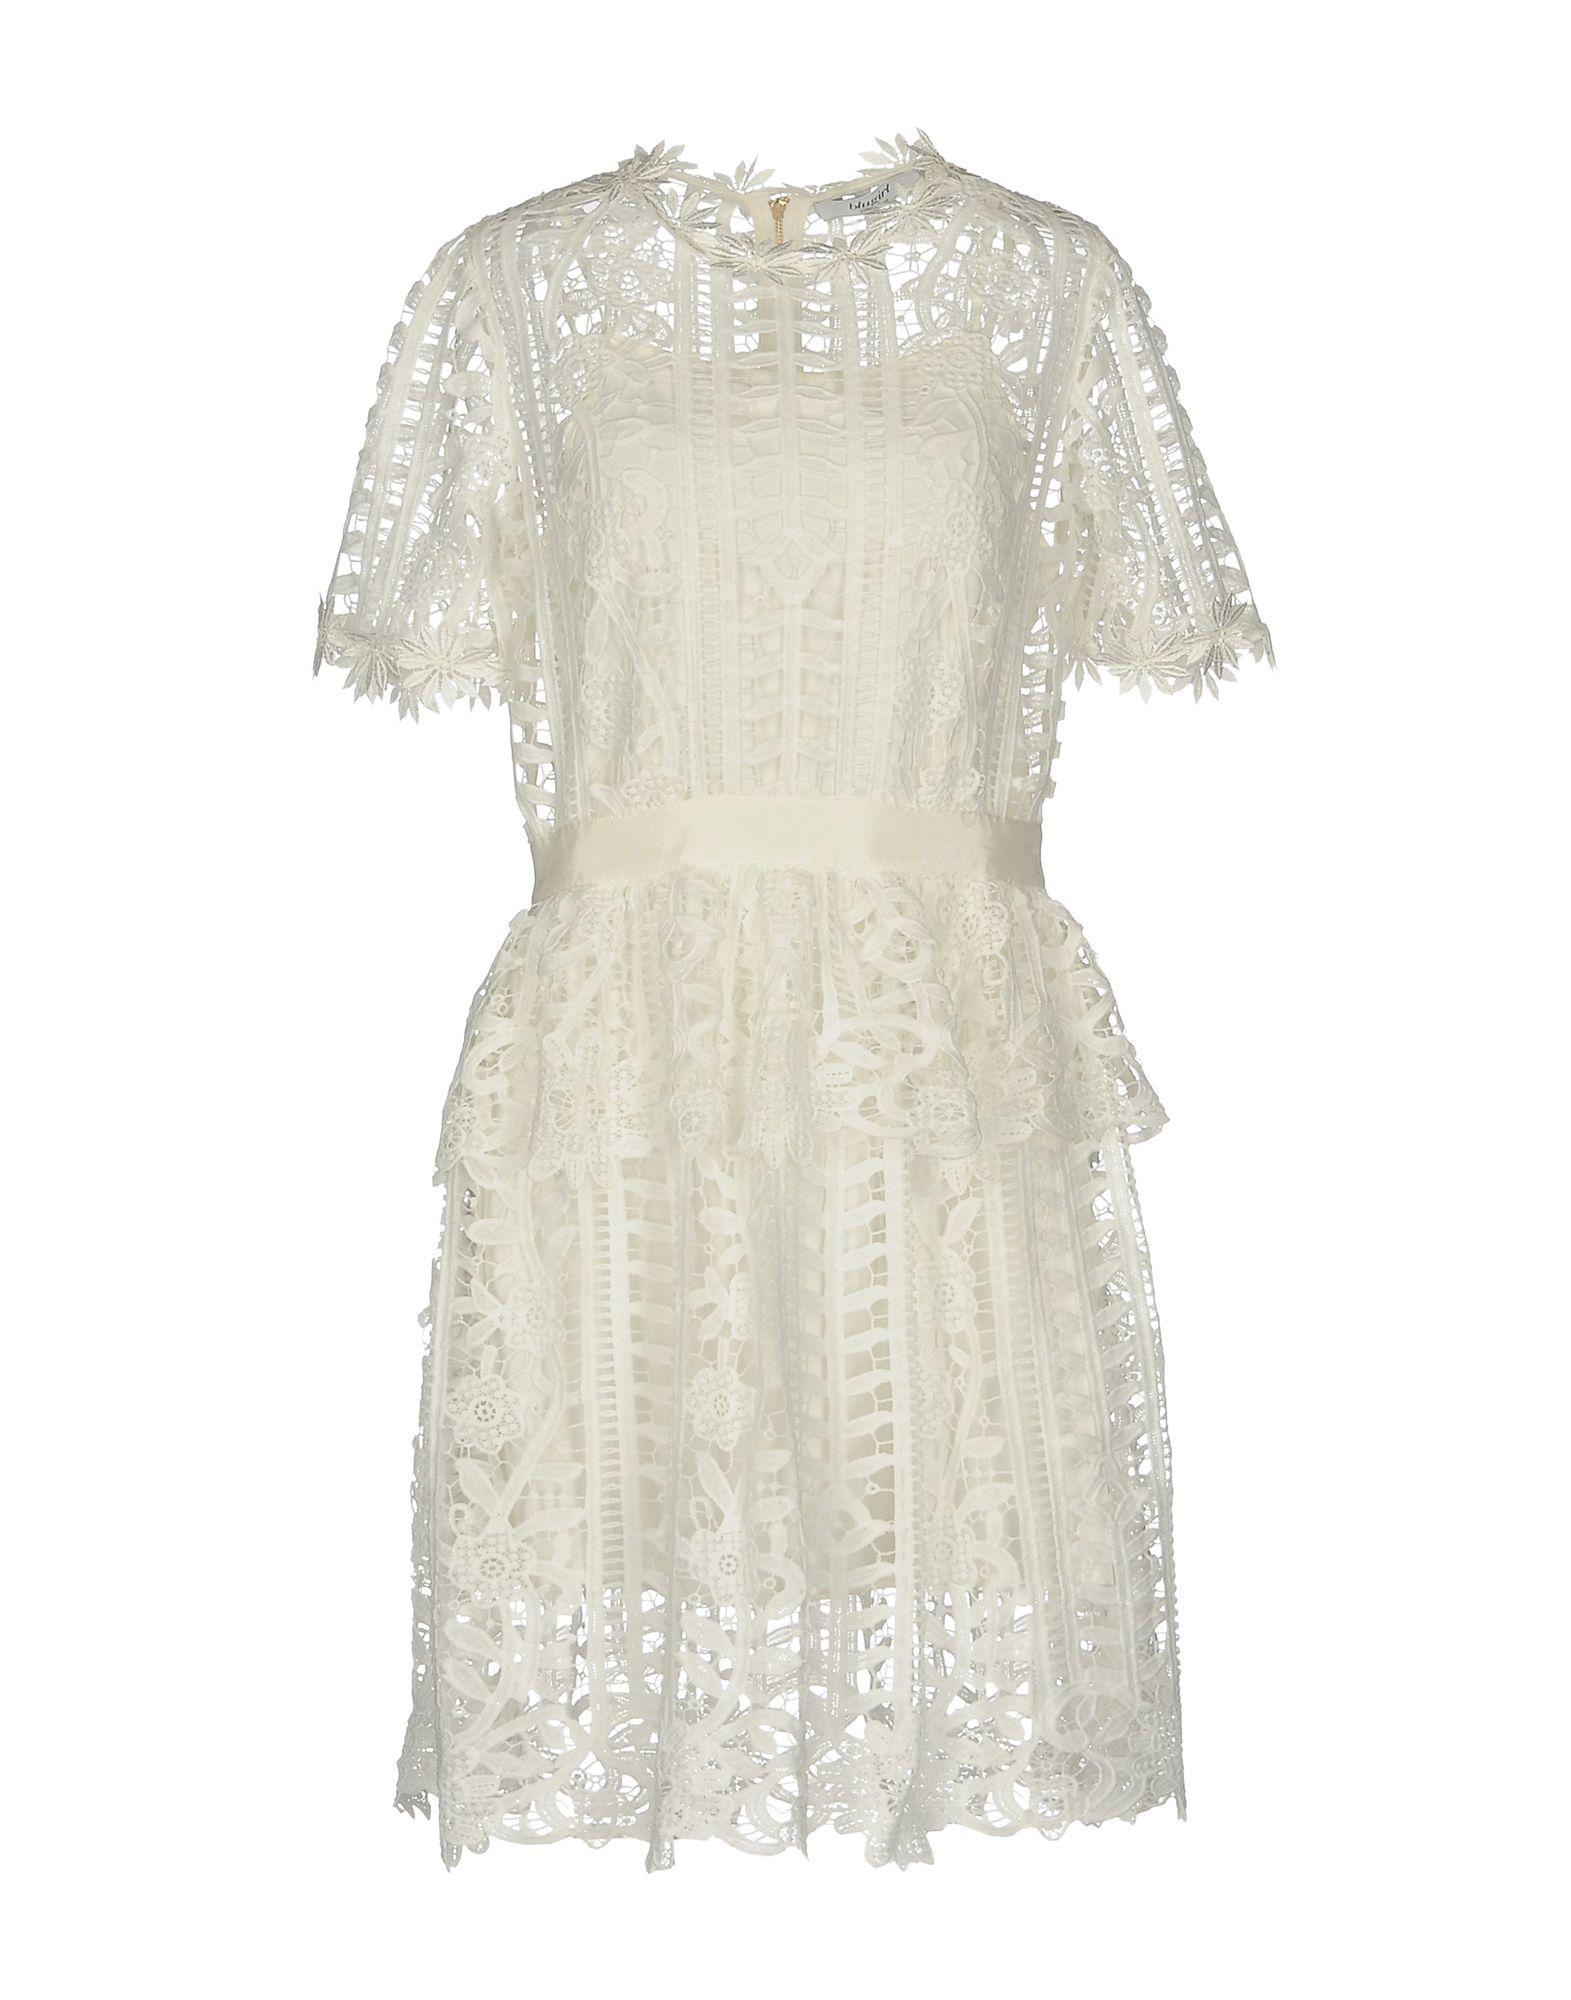 BLUGIRL BLUMARINE Короткое платье платье blugirl платья и сарафаны мини короткие